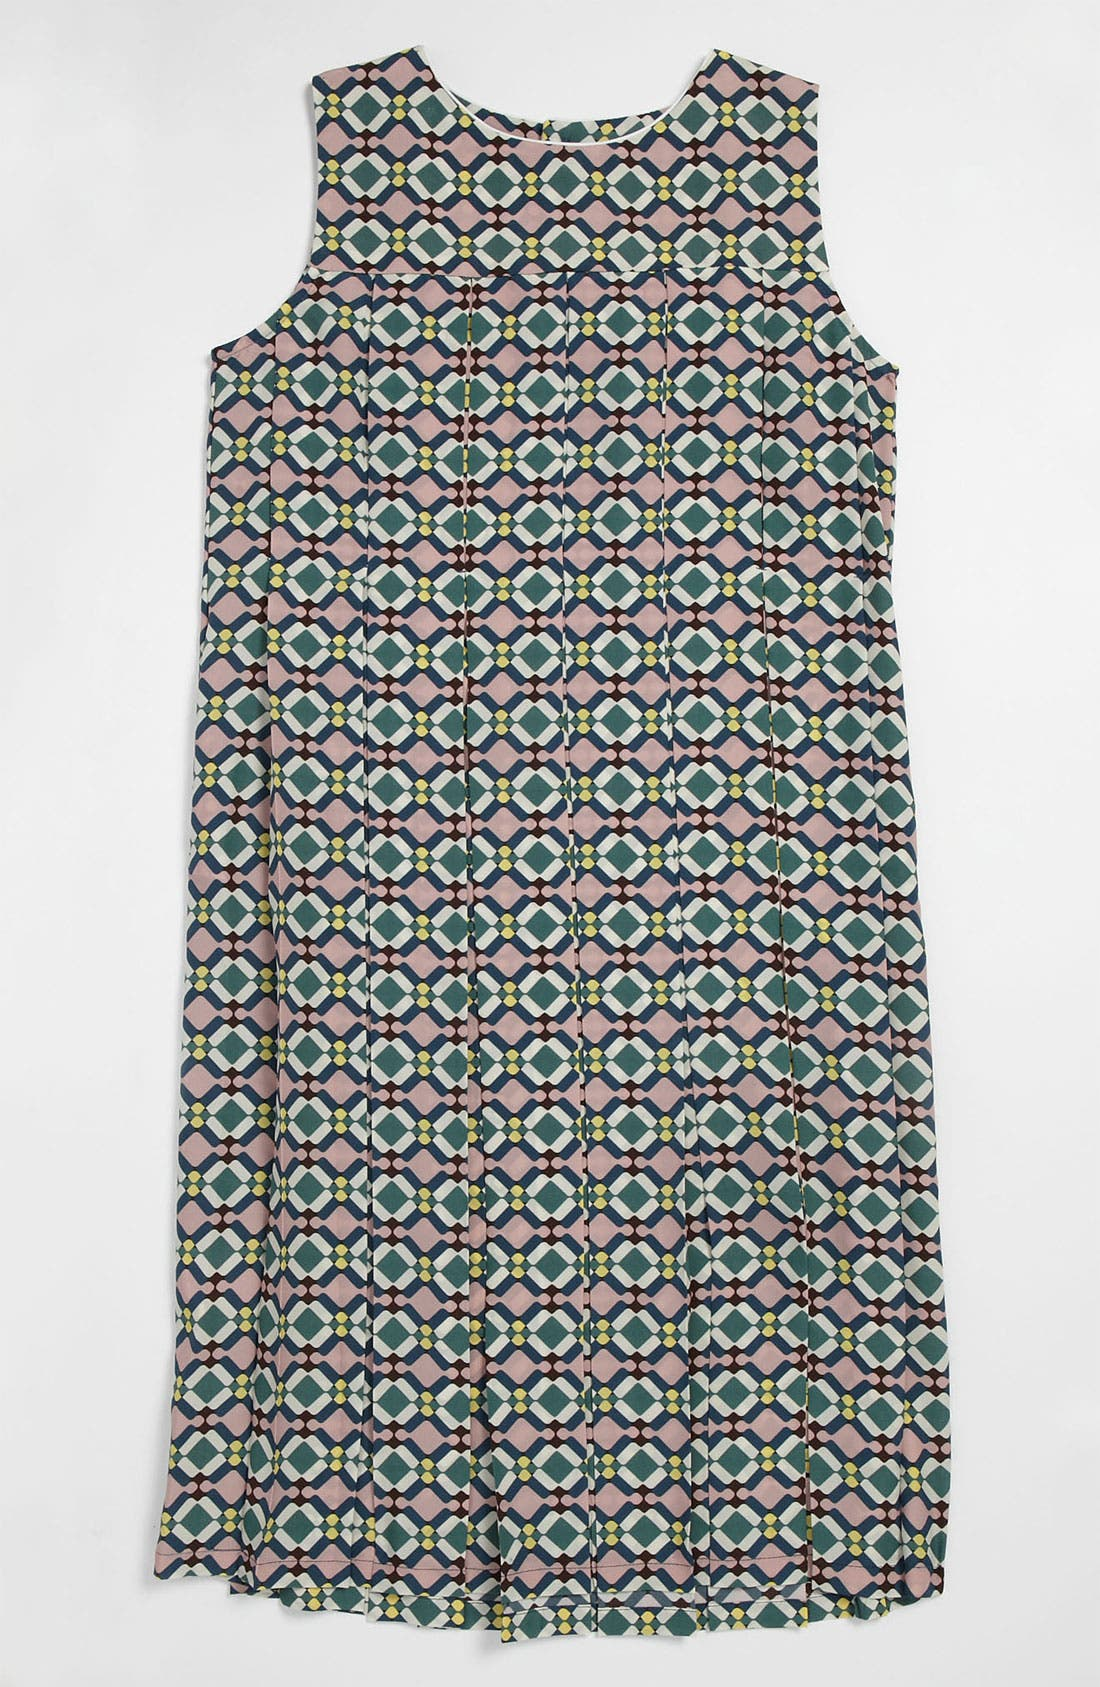 Alternate Image 1 Selected - Marni Print Pleat Dress (Little Girls & Big Girls)